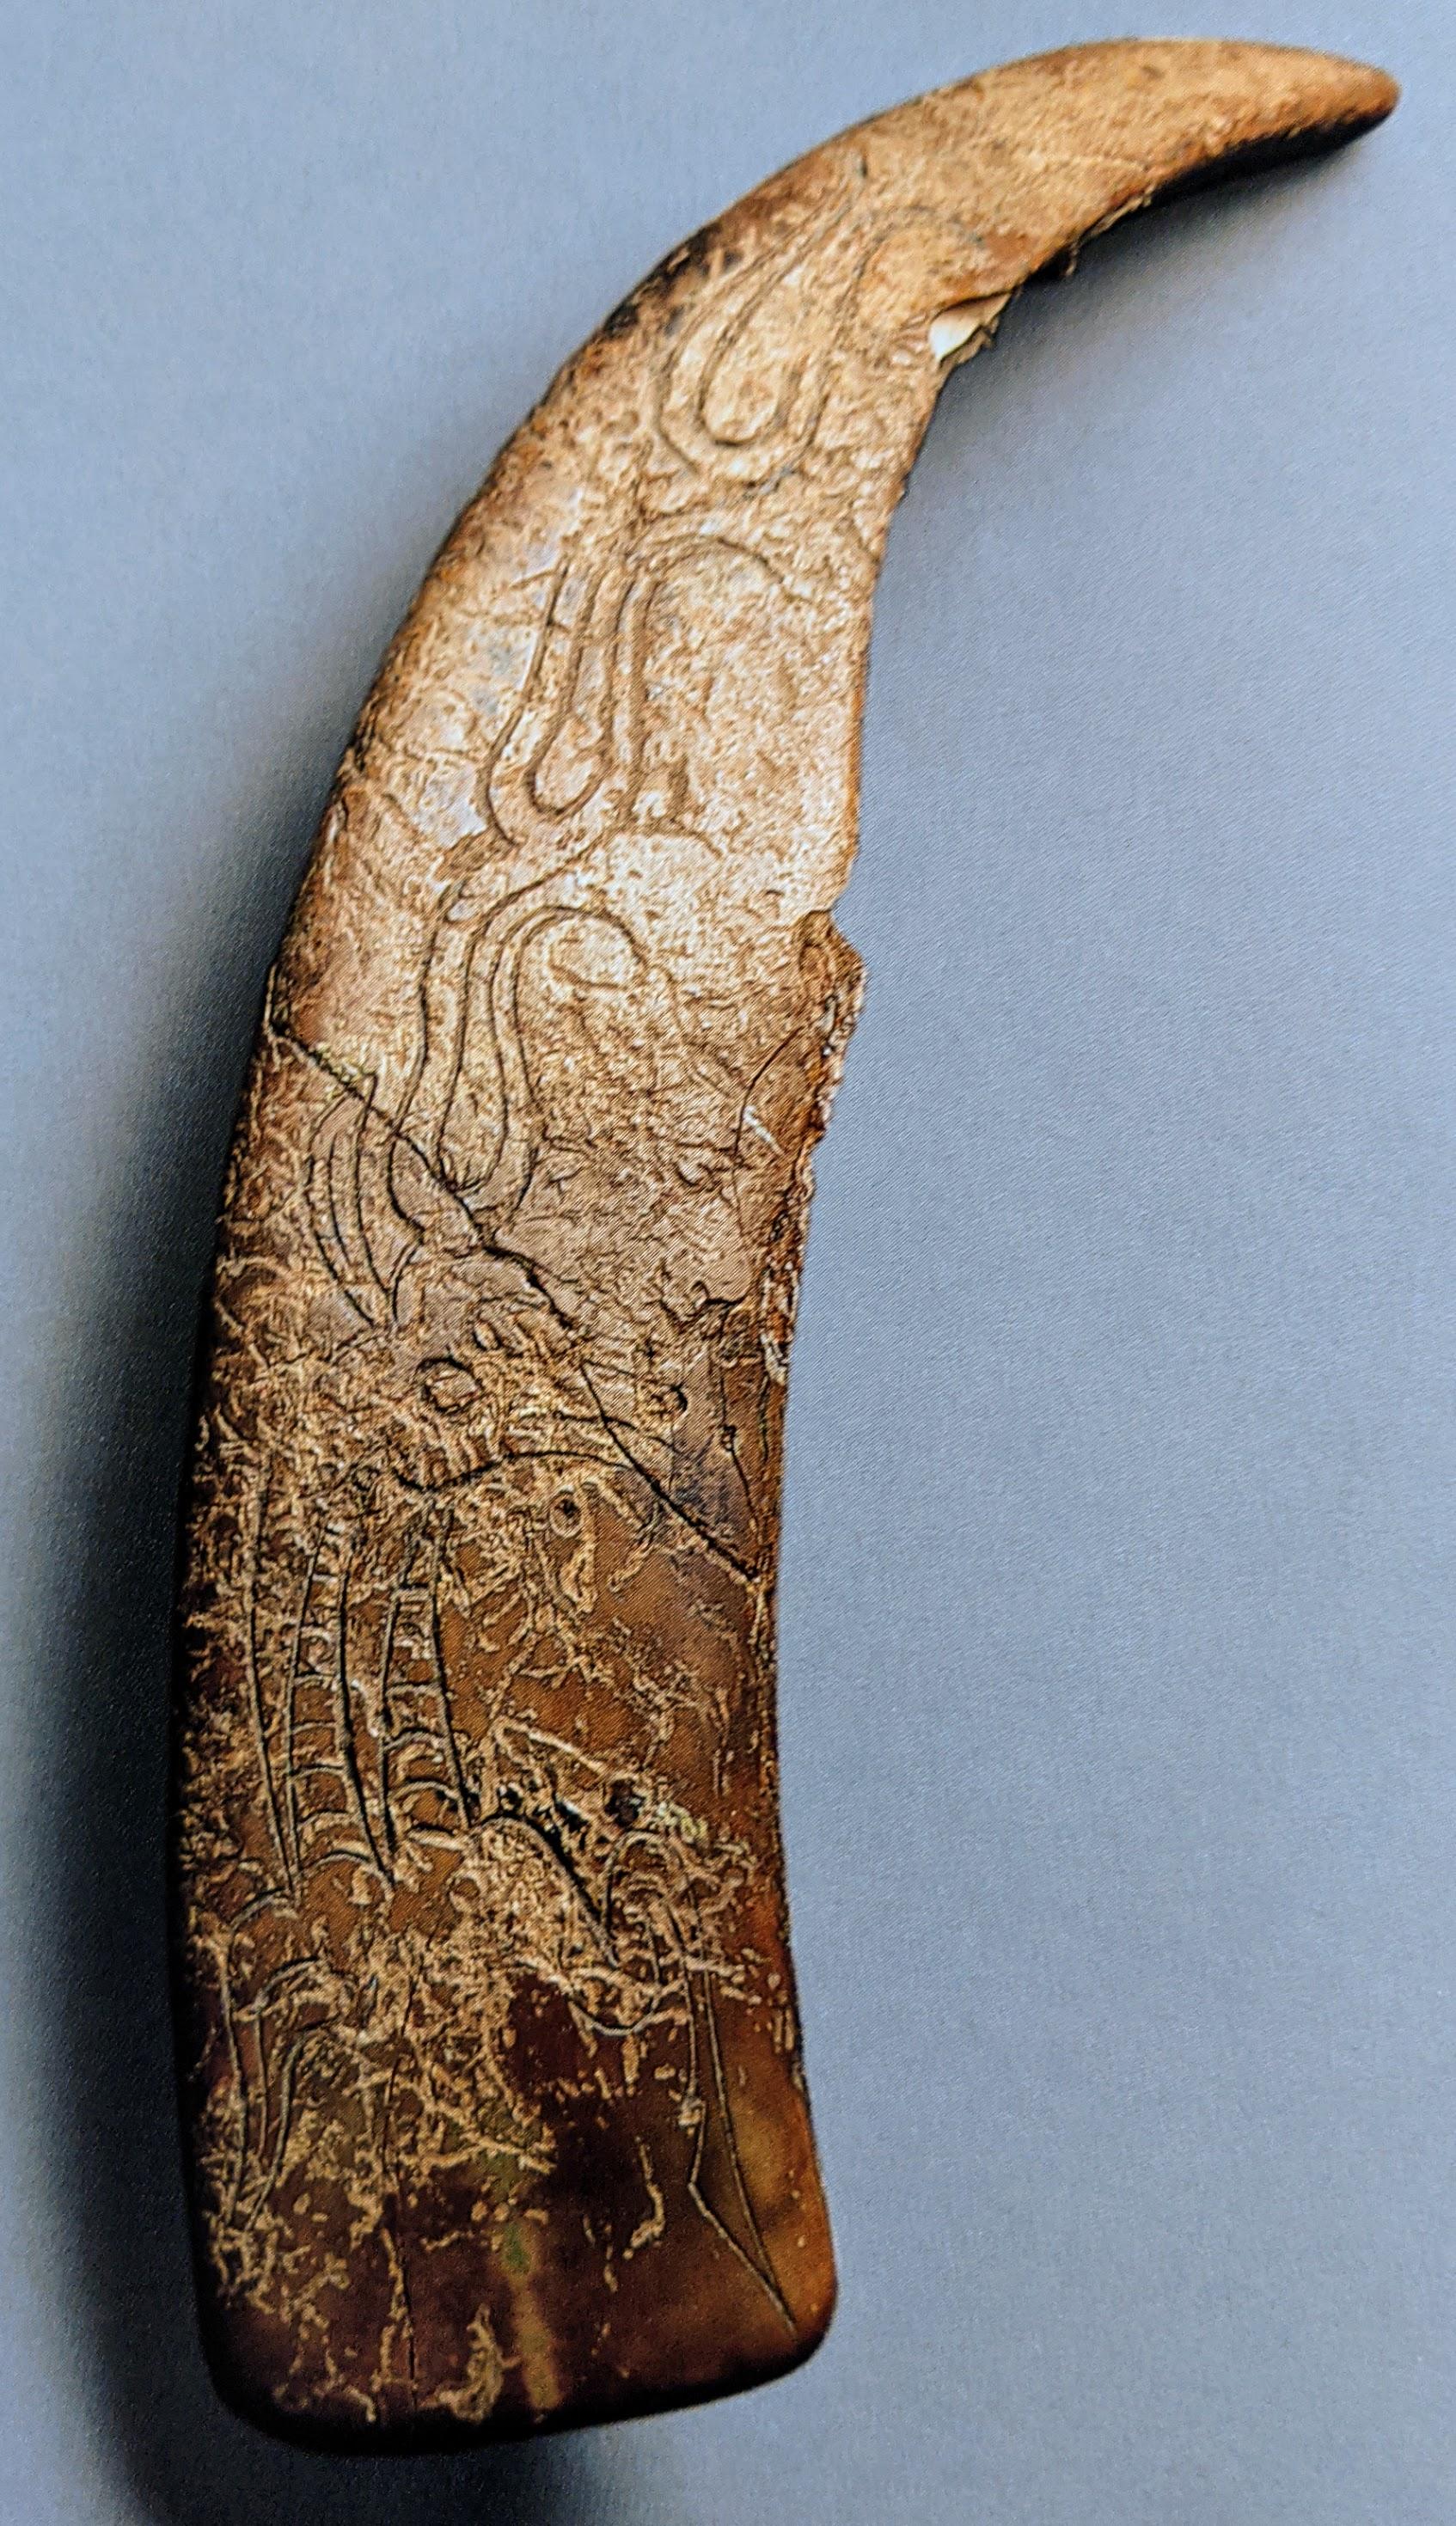 Boars tusk pendant